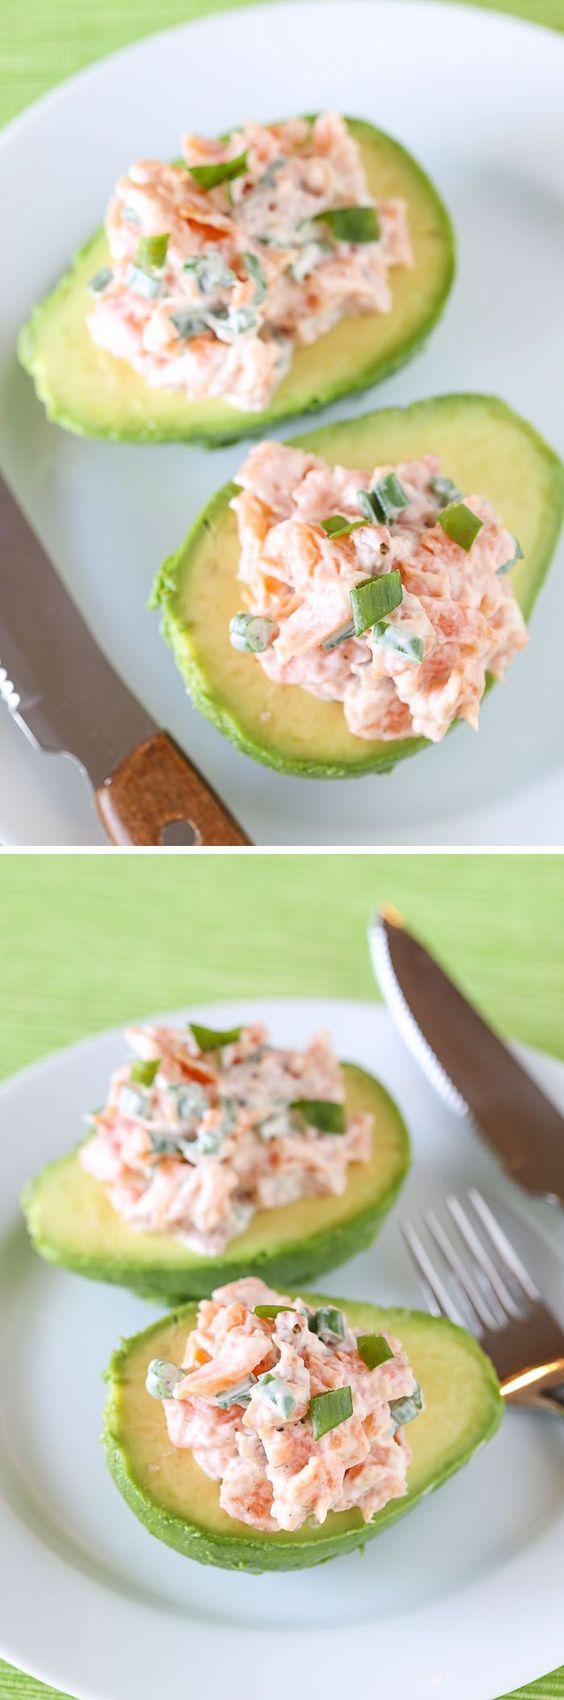 Smoked Salmon Salad in Avocado Boats #salmon #avocado #lunch